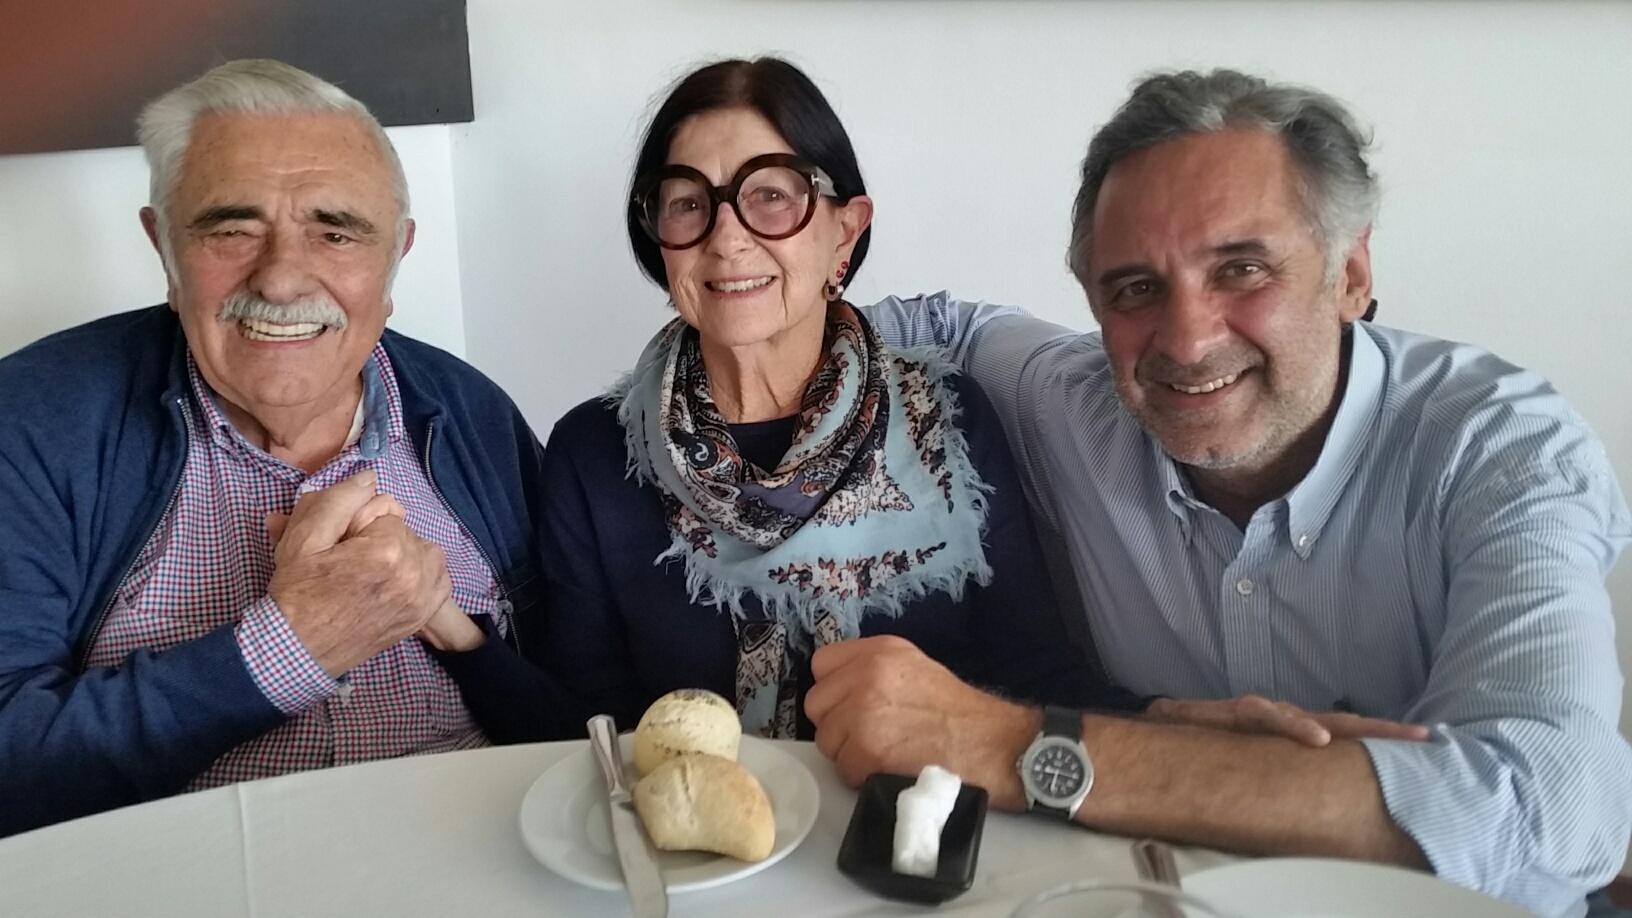 Don Pedro Serra, Betty Gold, and Don Miguel Serra at  Ultima Hora,  Palma de Mallorca, Spain